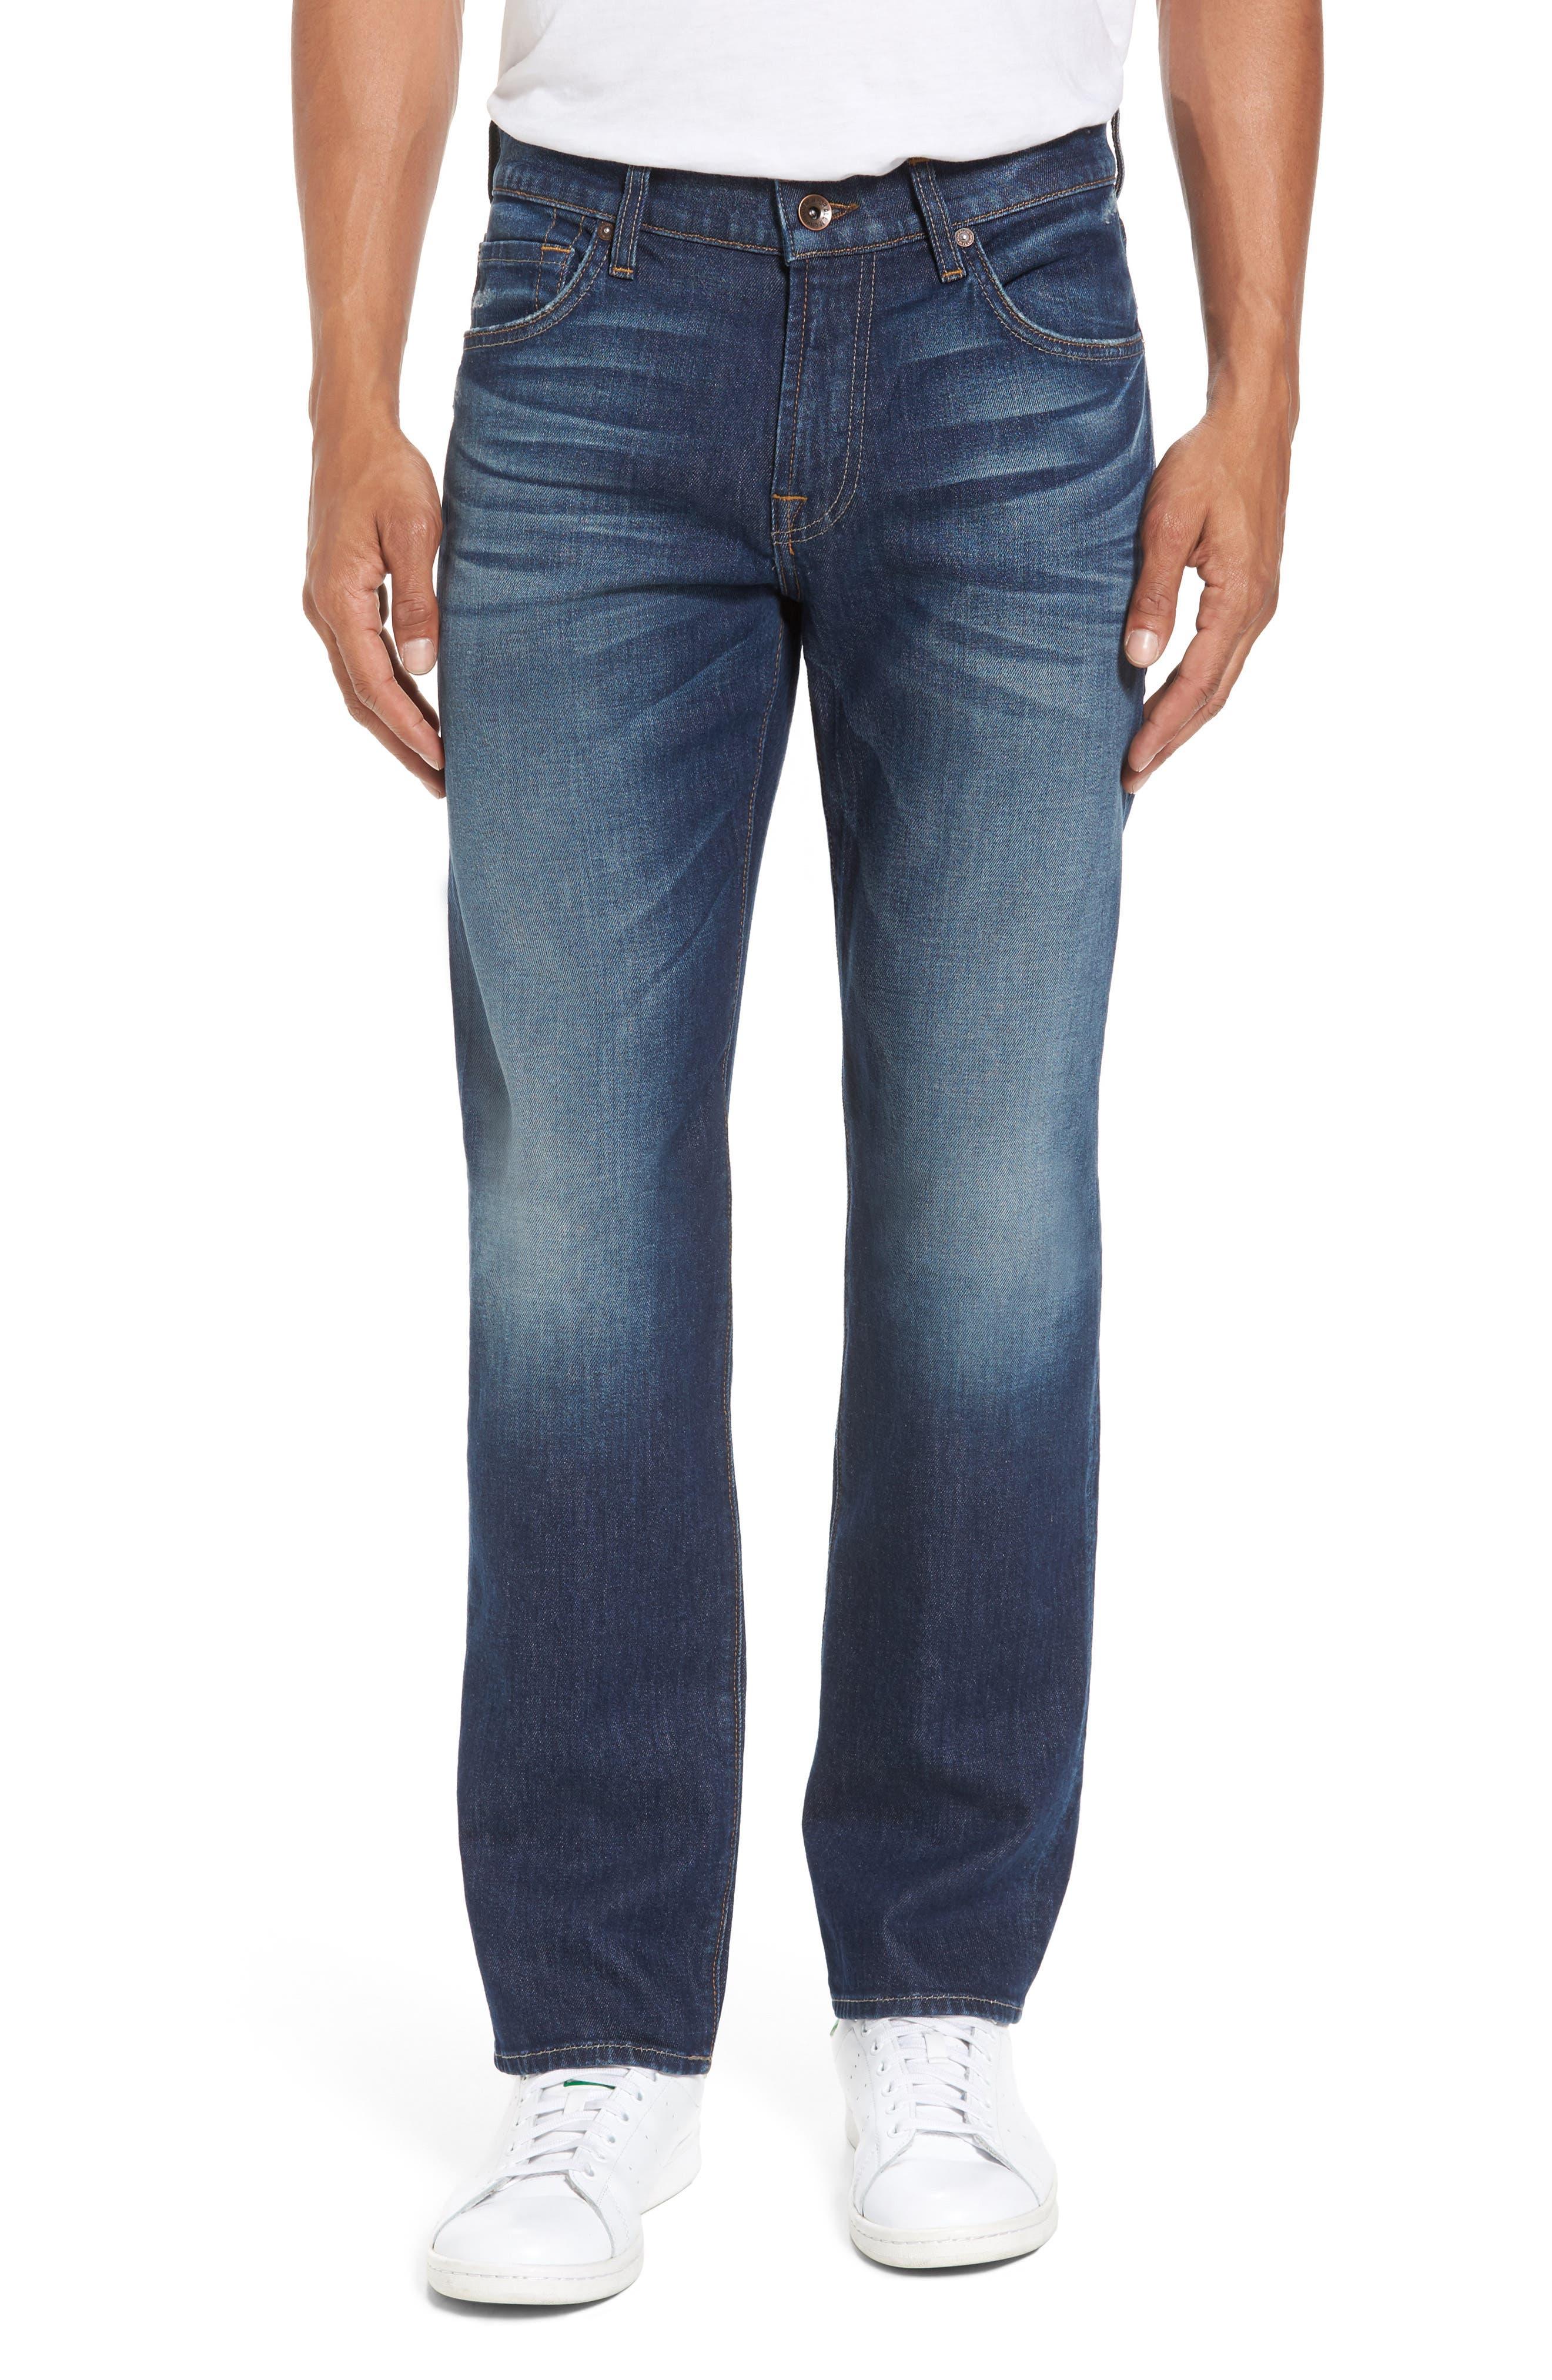 Alternate Image 1 Selected - 7 For All Mankind® Slimmy Slim Fit Jeans (Venture)